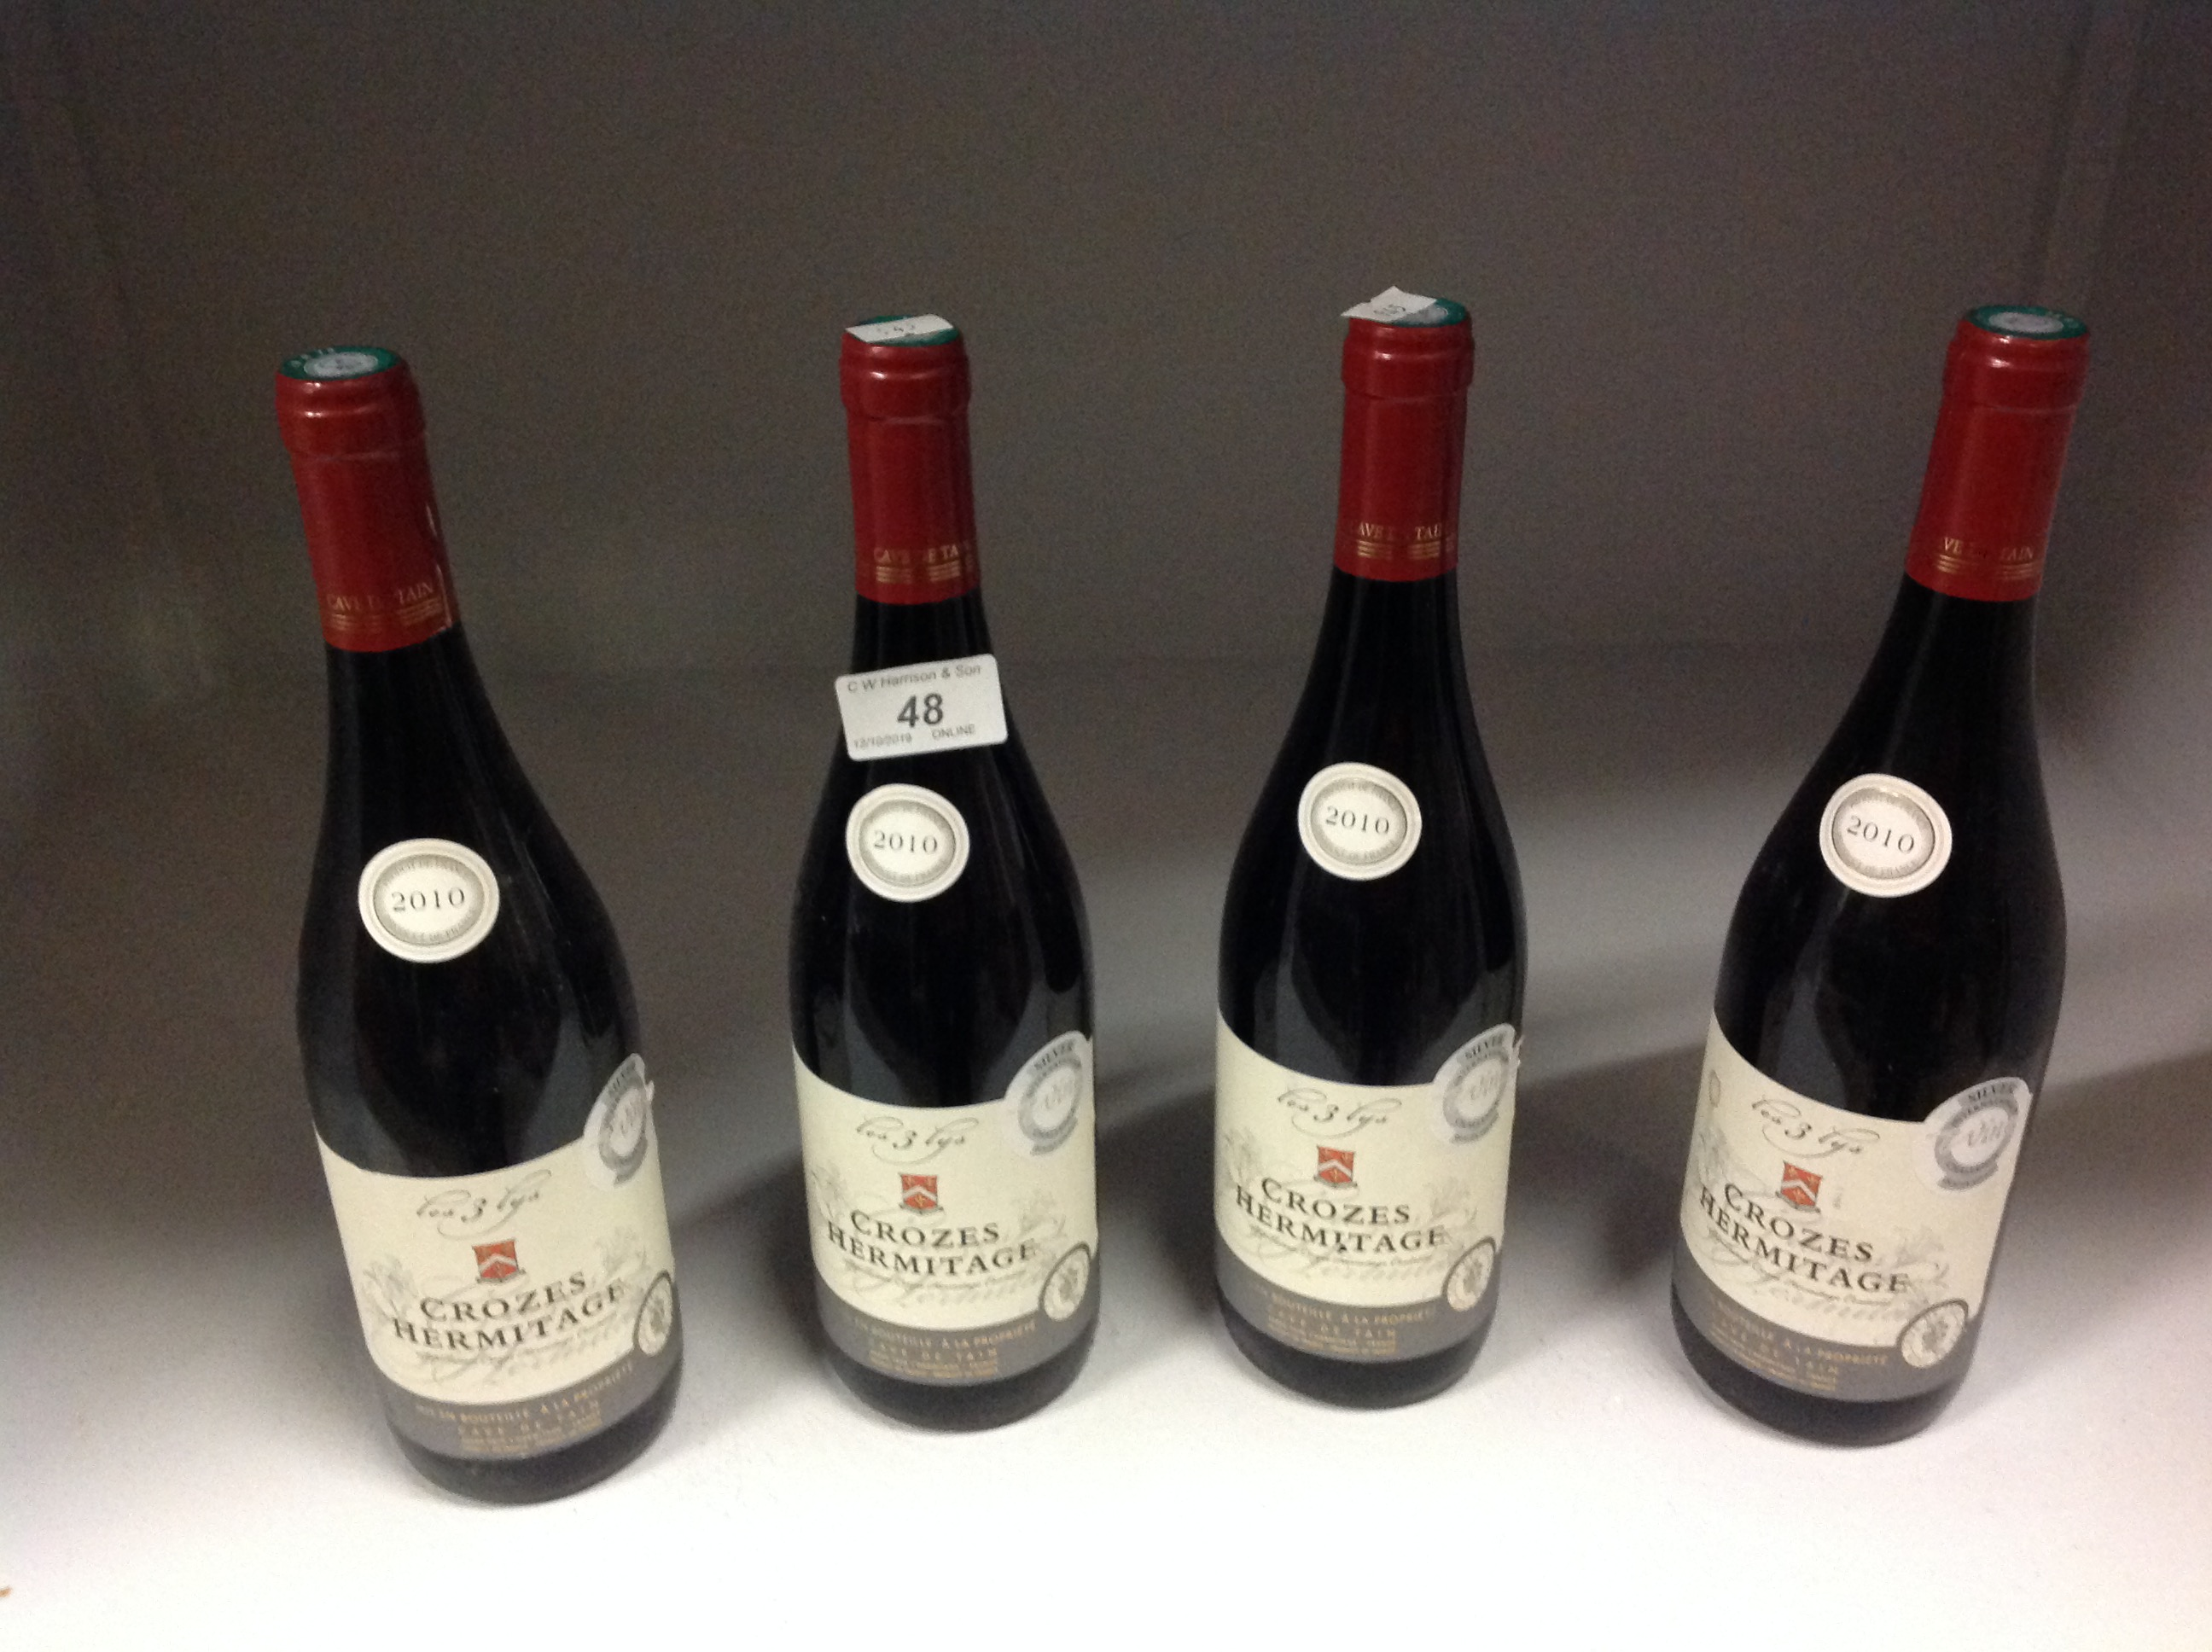 Lot 48 - 4 x 750ml bottles Crozes Hermitage - 201